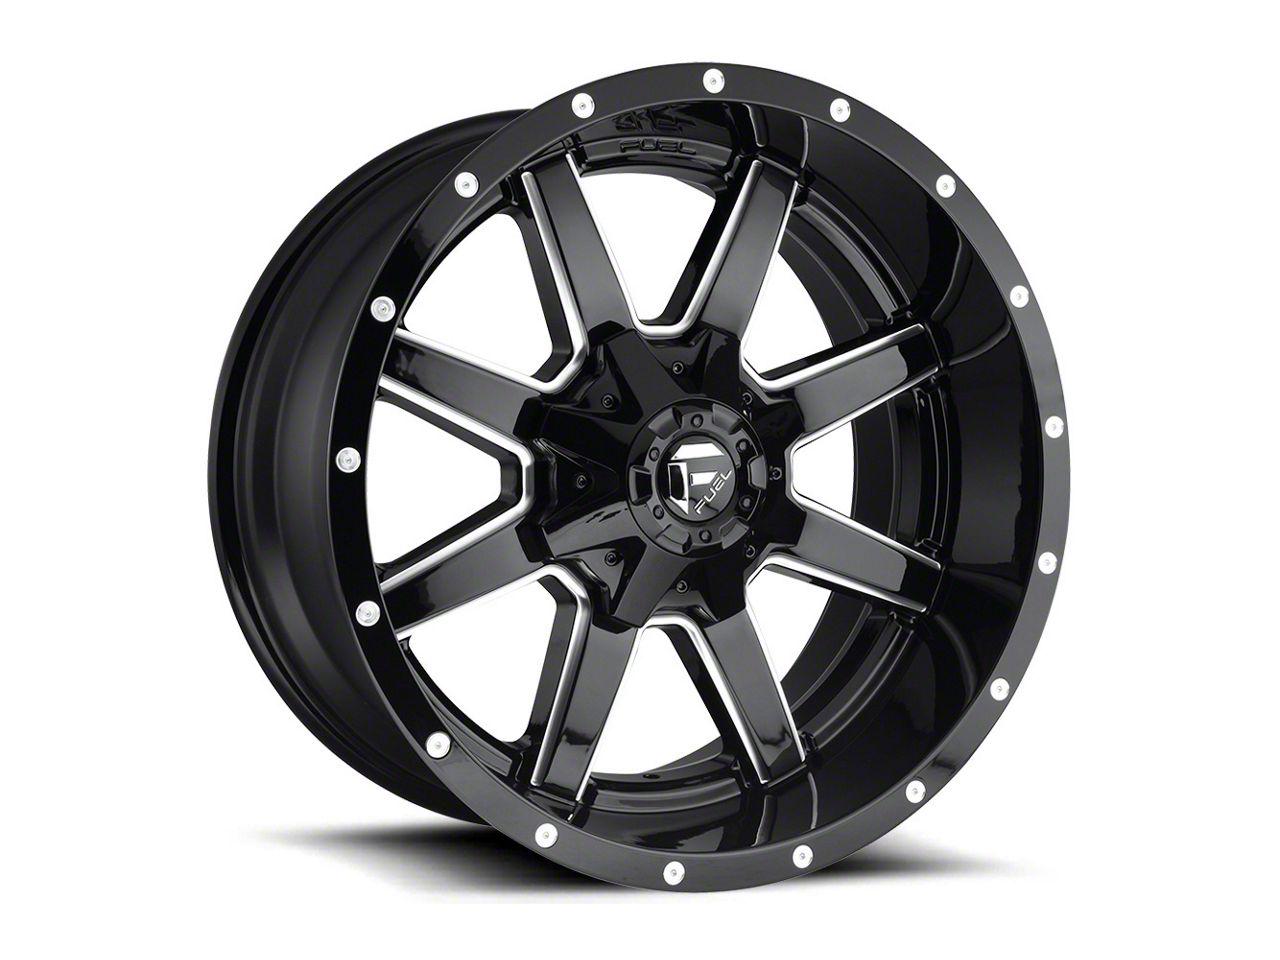 Fuel Wheels Maverick Gloss Black Milled 5-Lug Wheel - 18x9 (02-18 RAM 1500, Excluding Mega Cab)